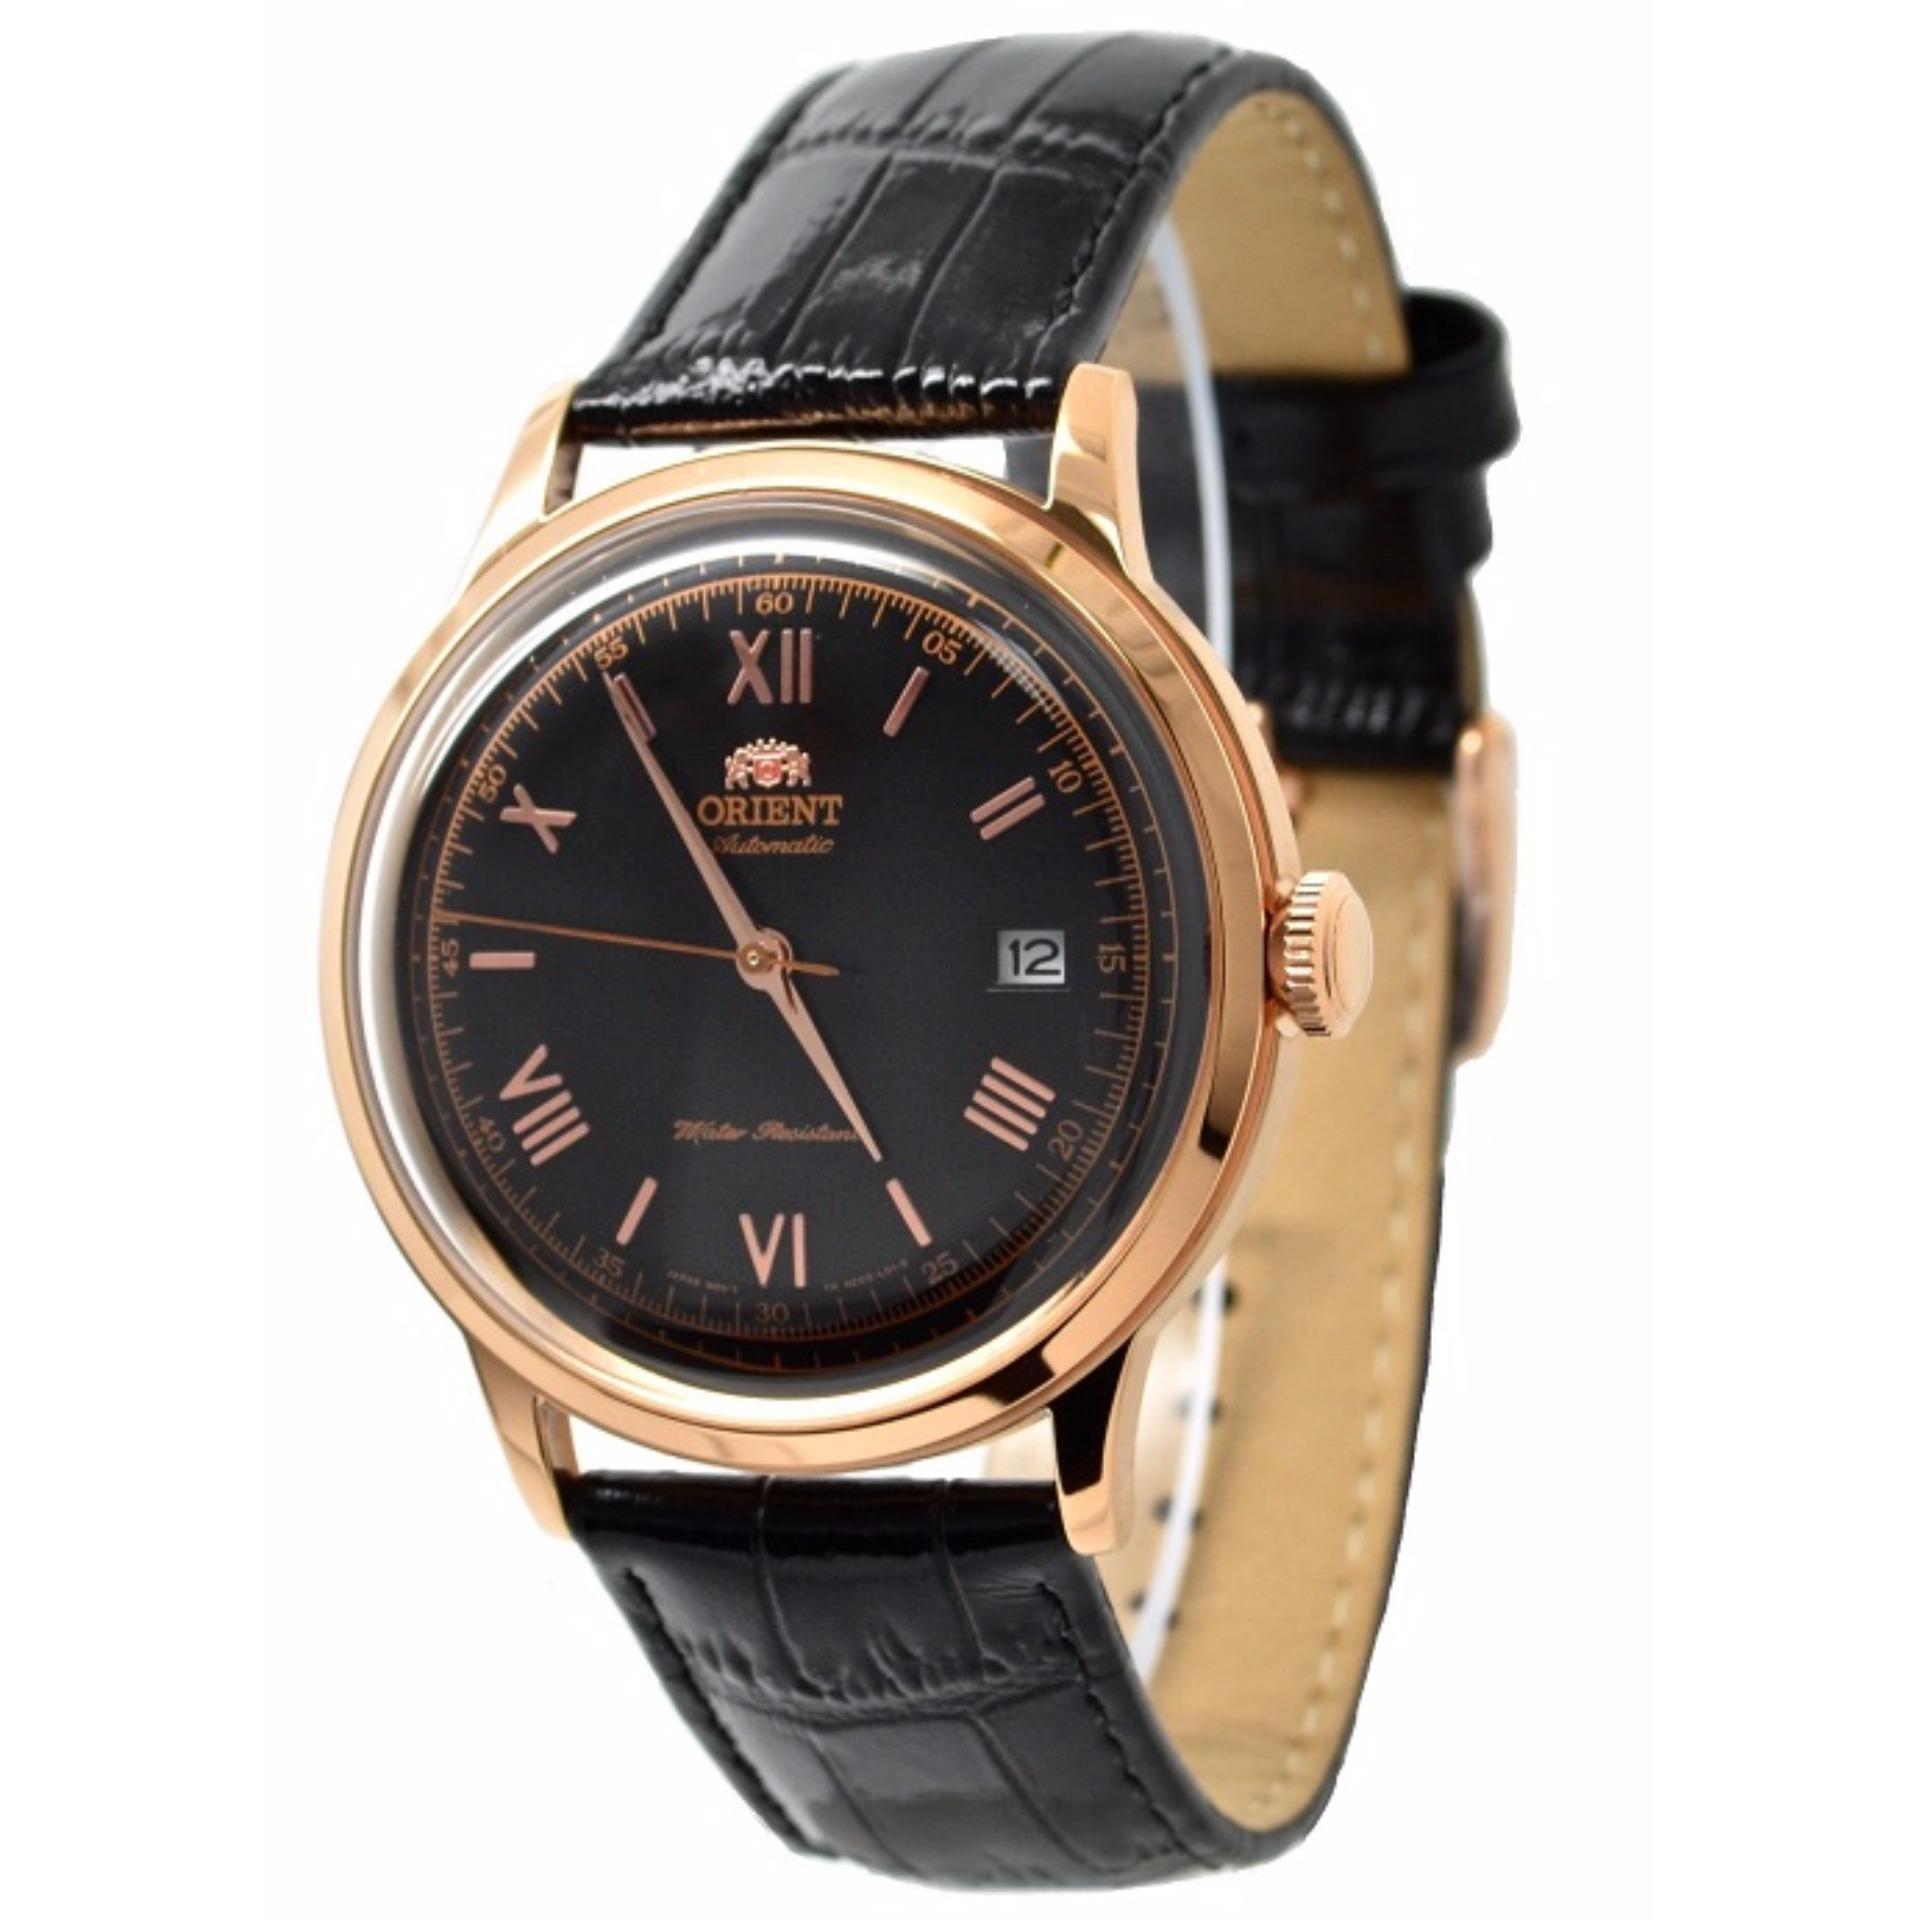 Đồng hồ nam dây da Orient Bambino Gen 2nd Version 2 FAC00006B0